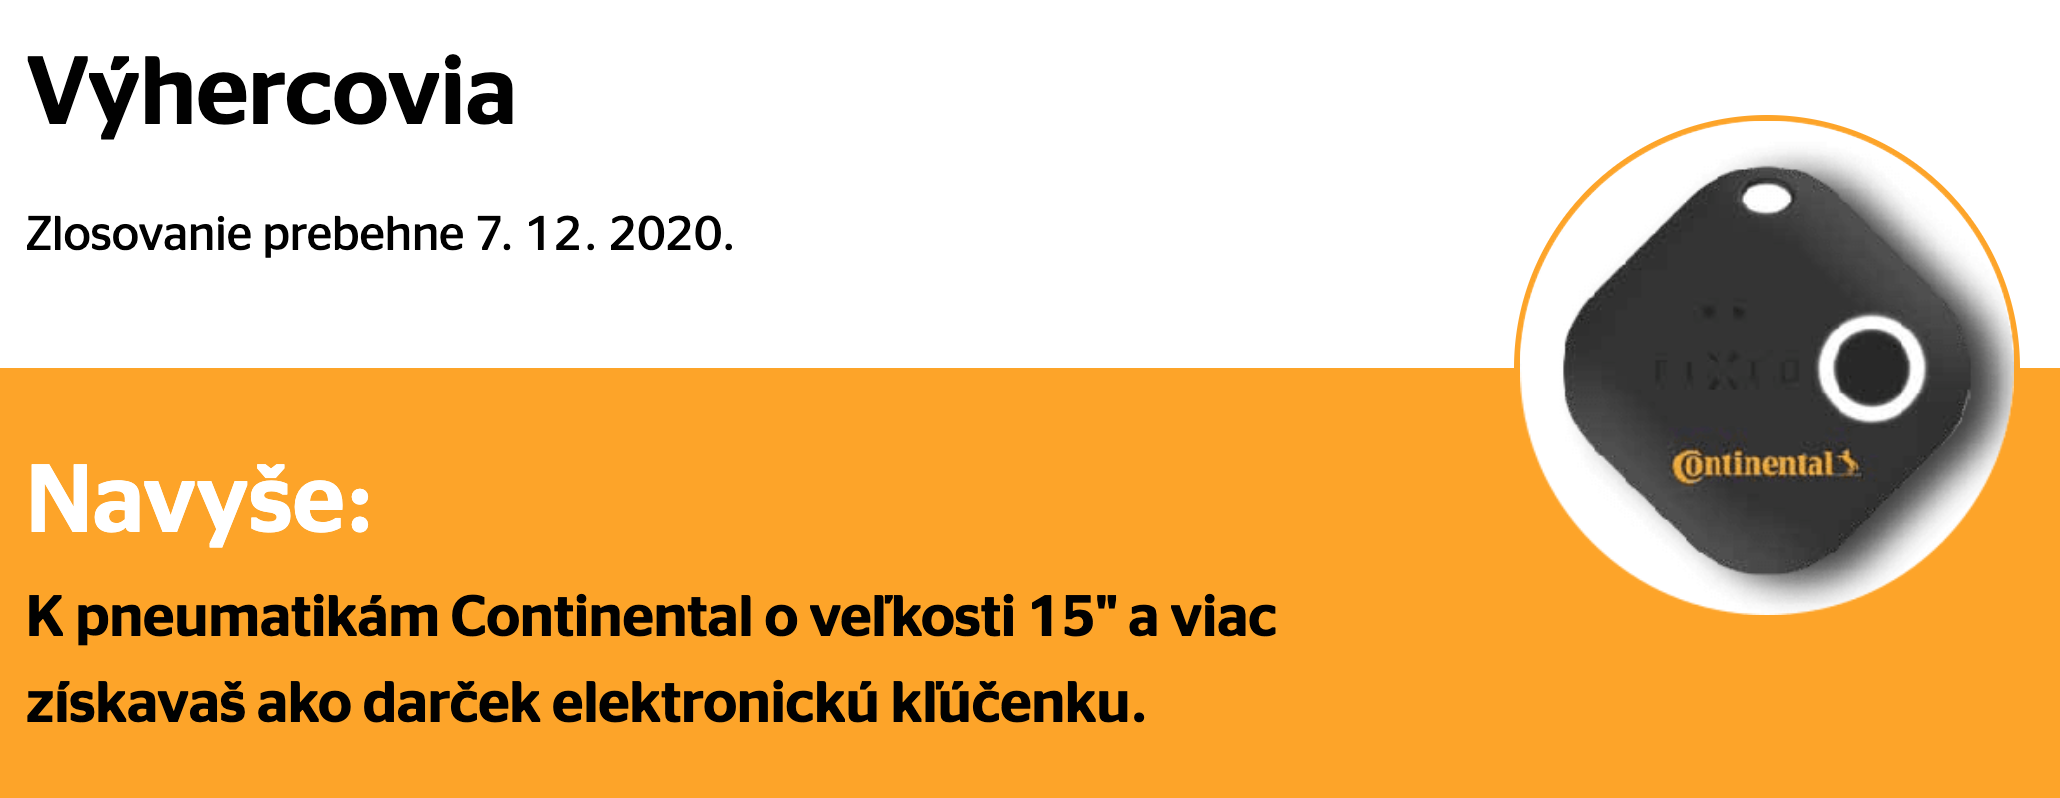 ContiHra zima 2020 kľúčenka